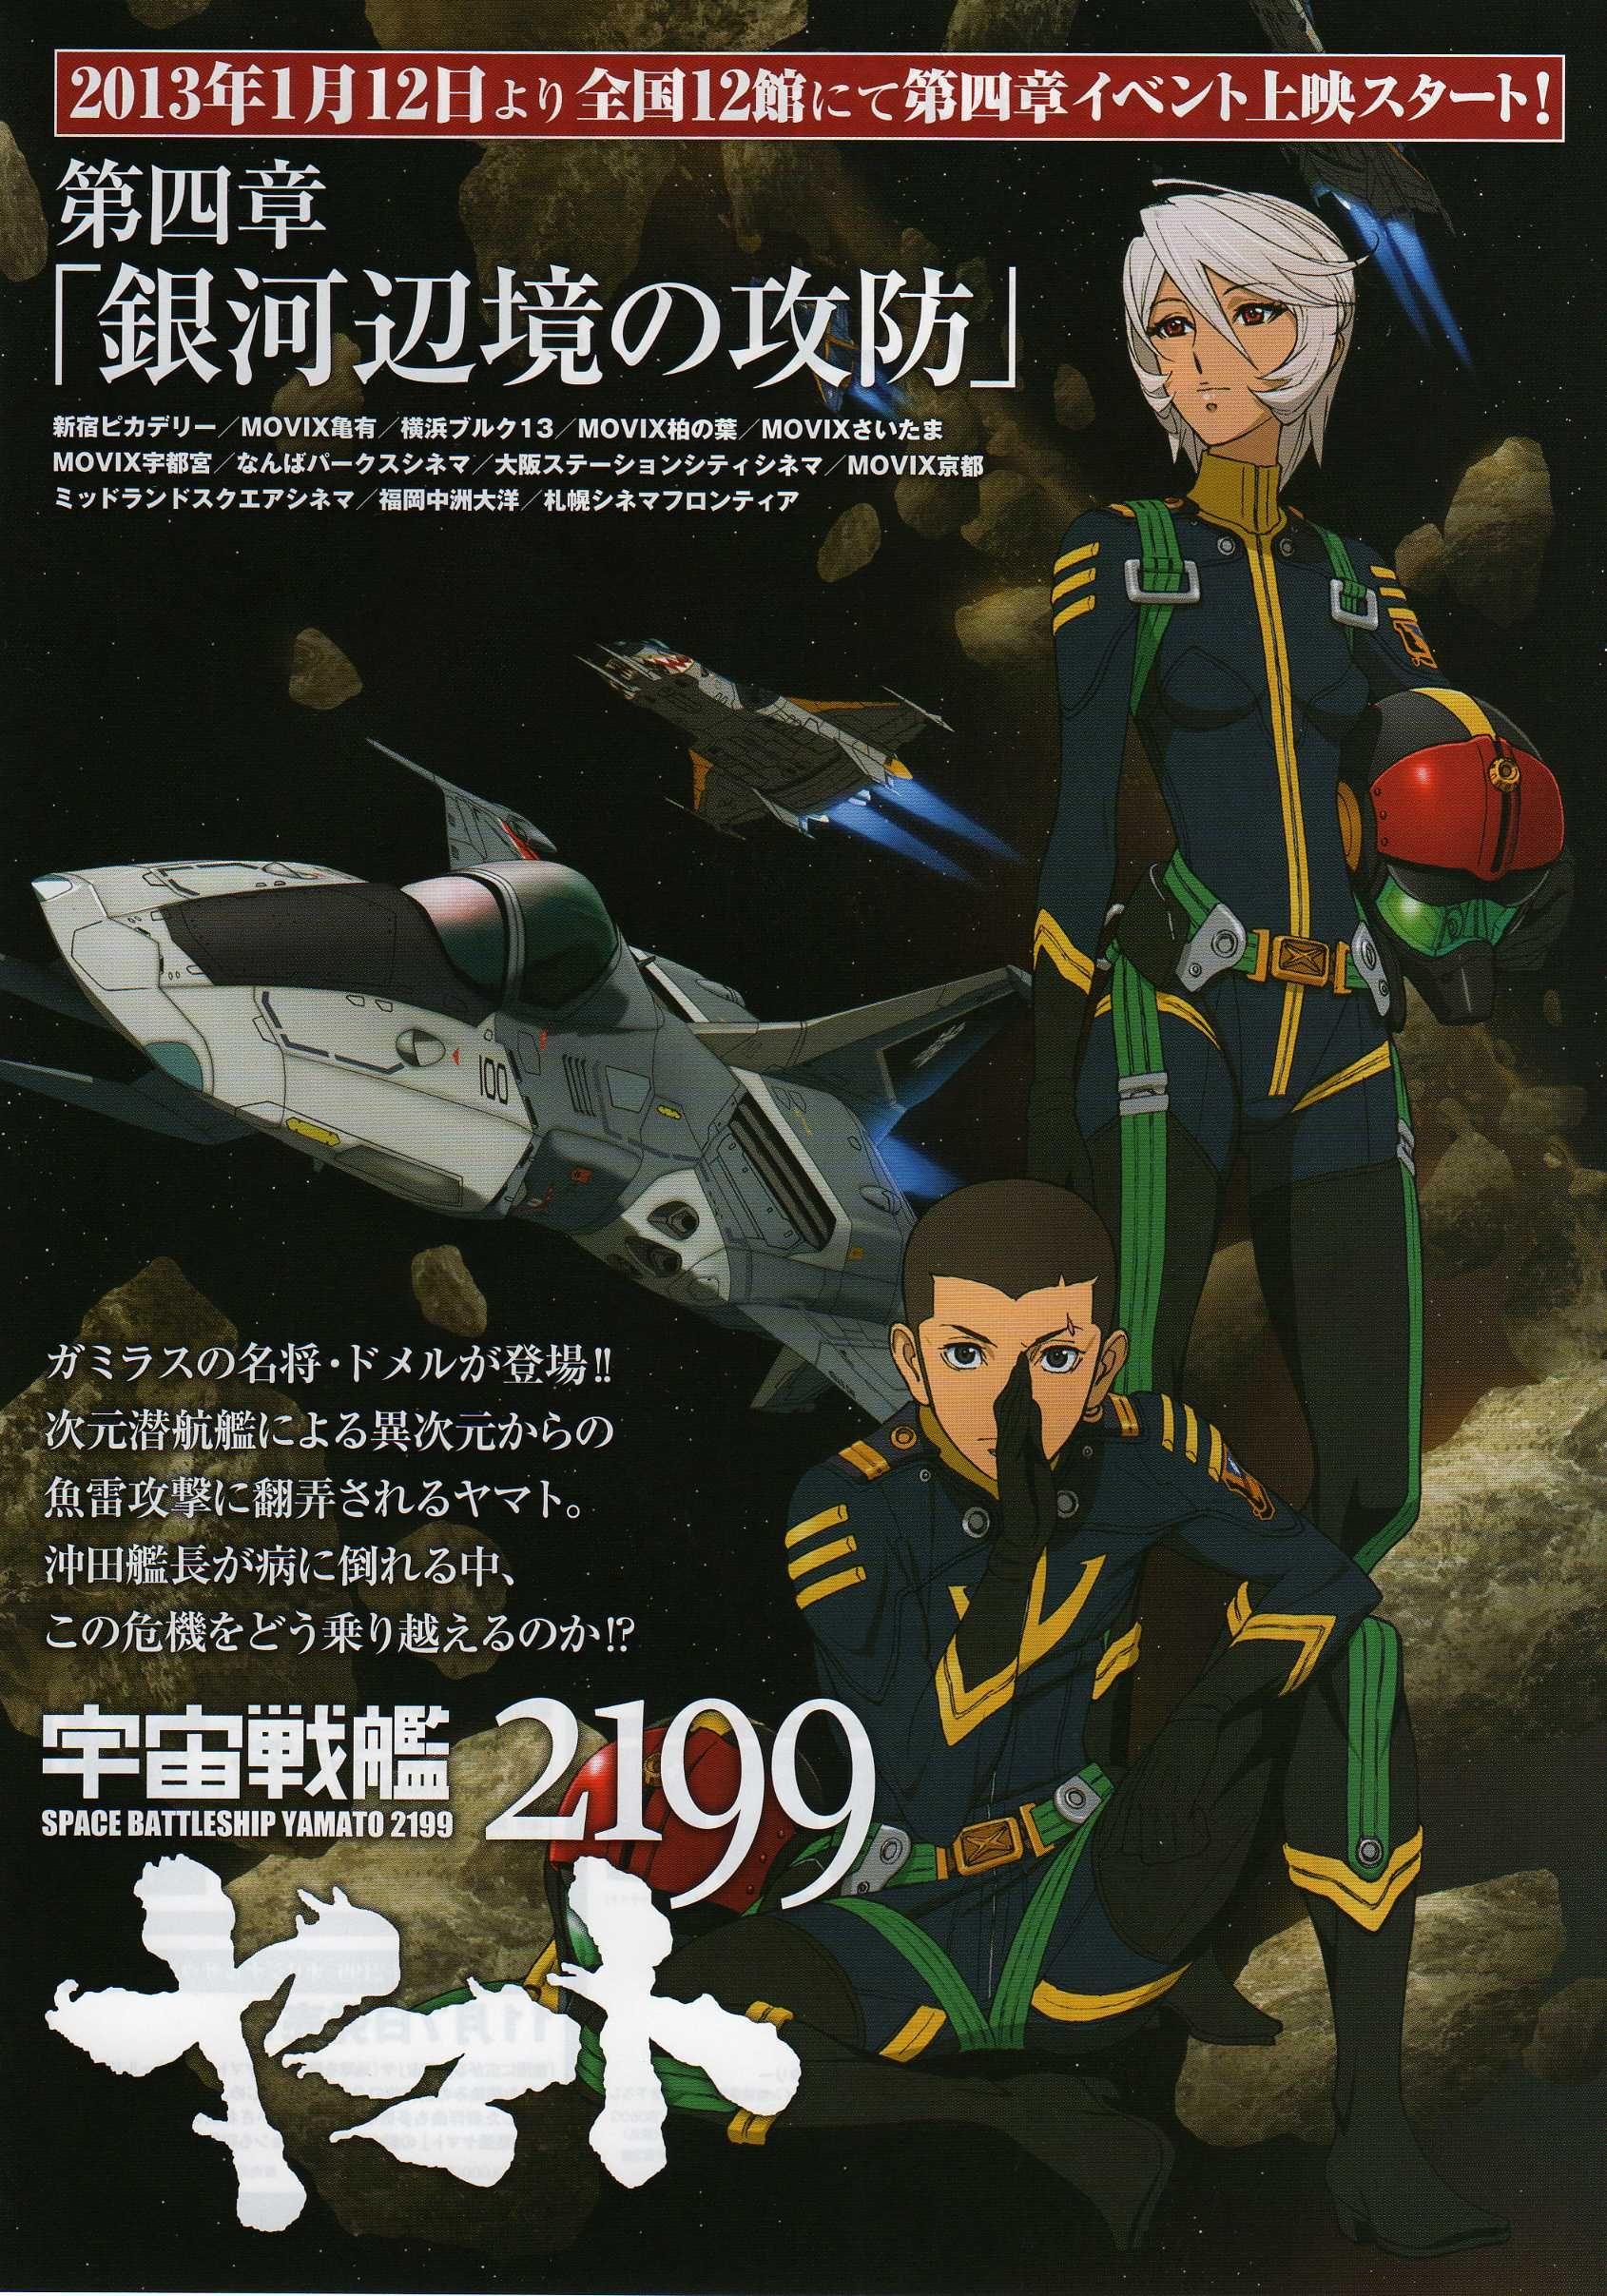 Space Battleship Yamato 2199 Promo Poster W Akira Kato Space